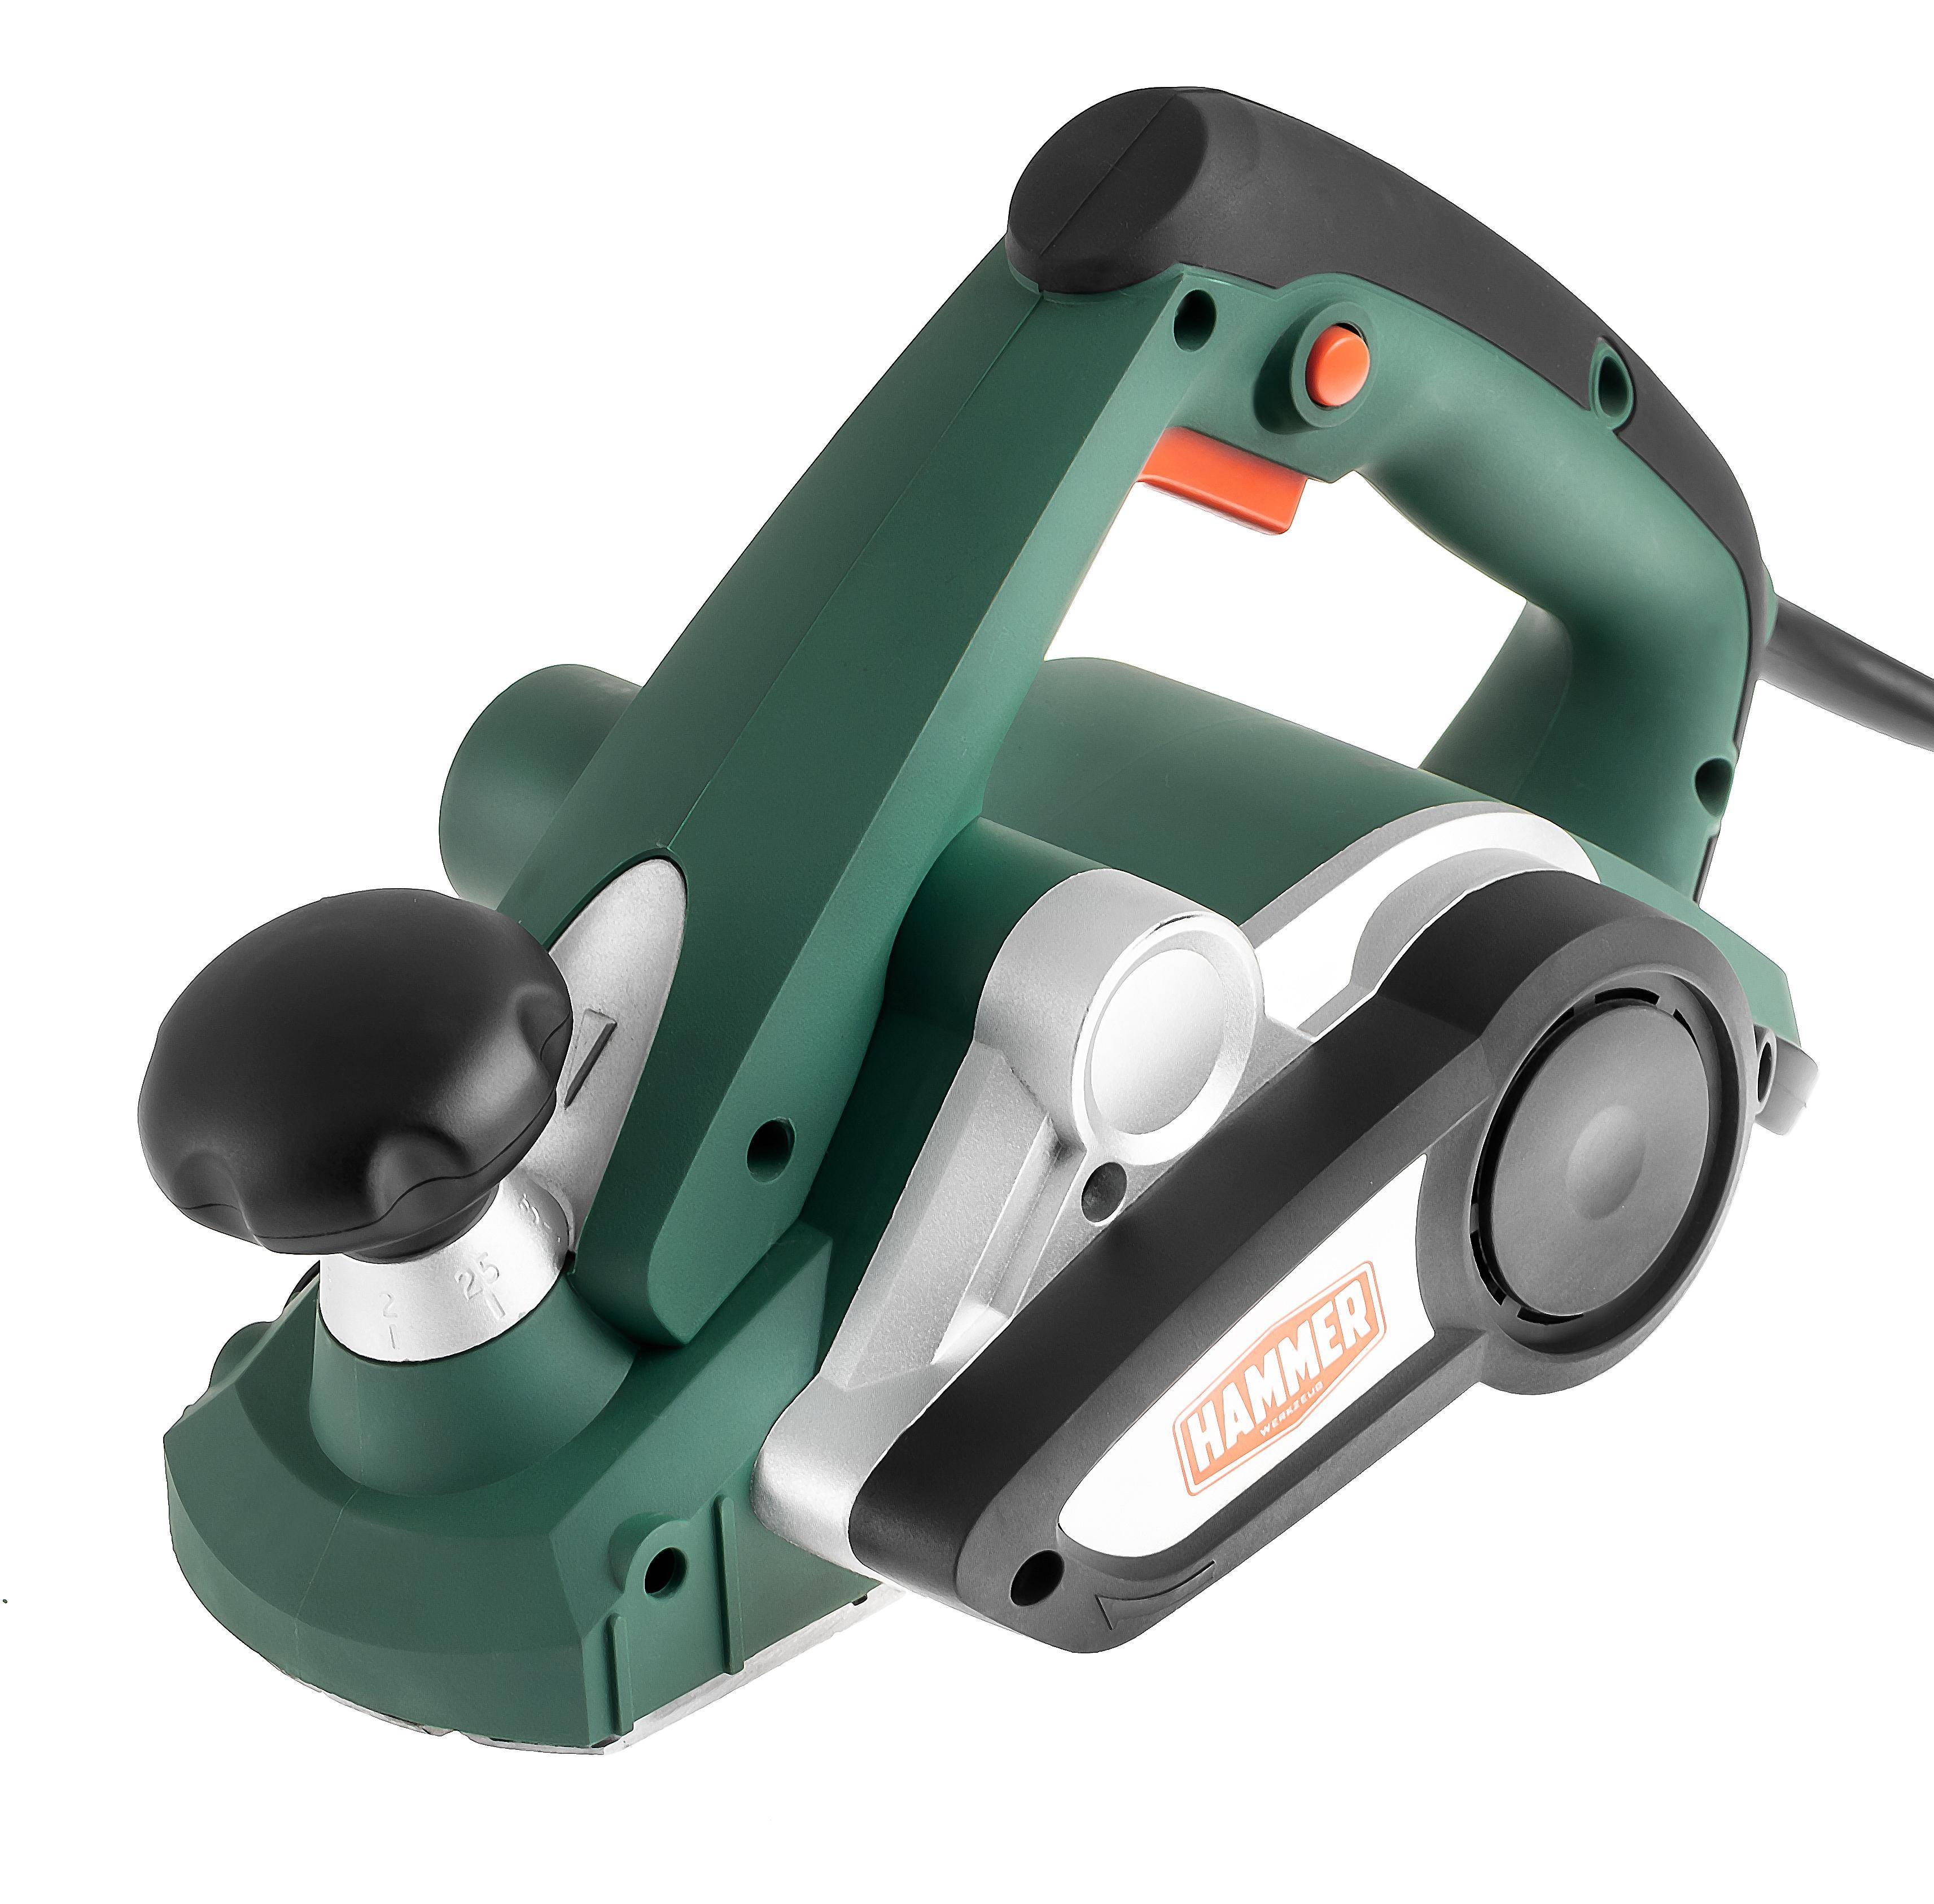 Рубанок Hammer Rnk900 цена